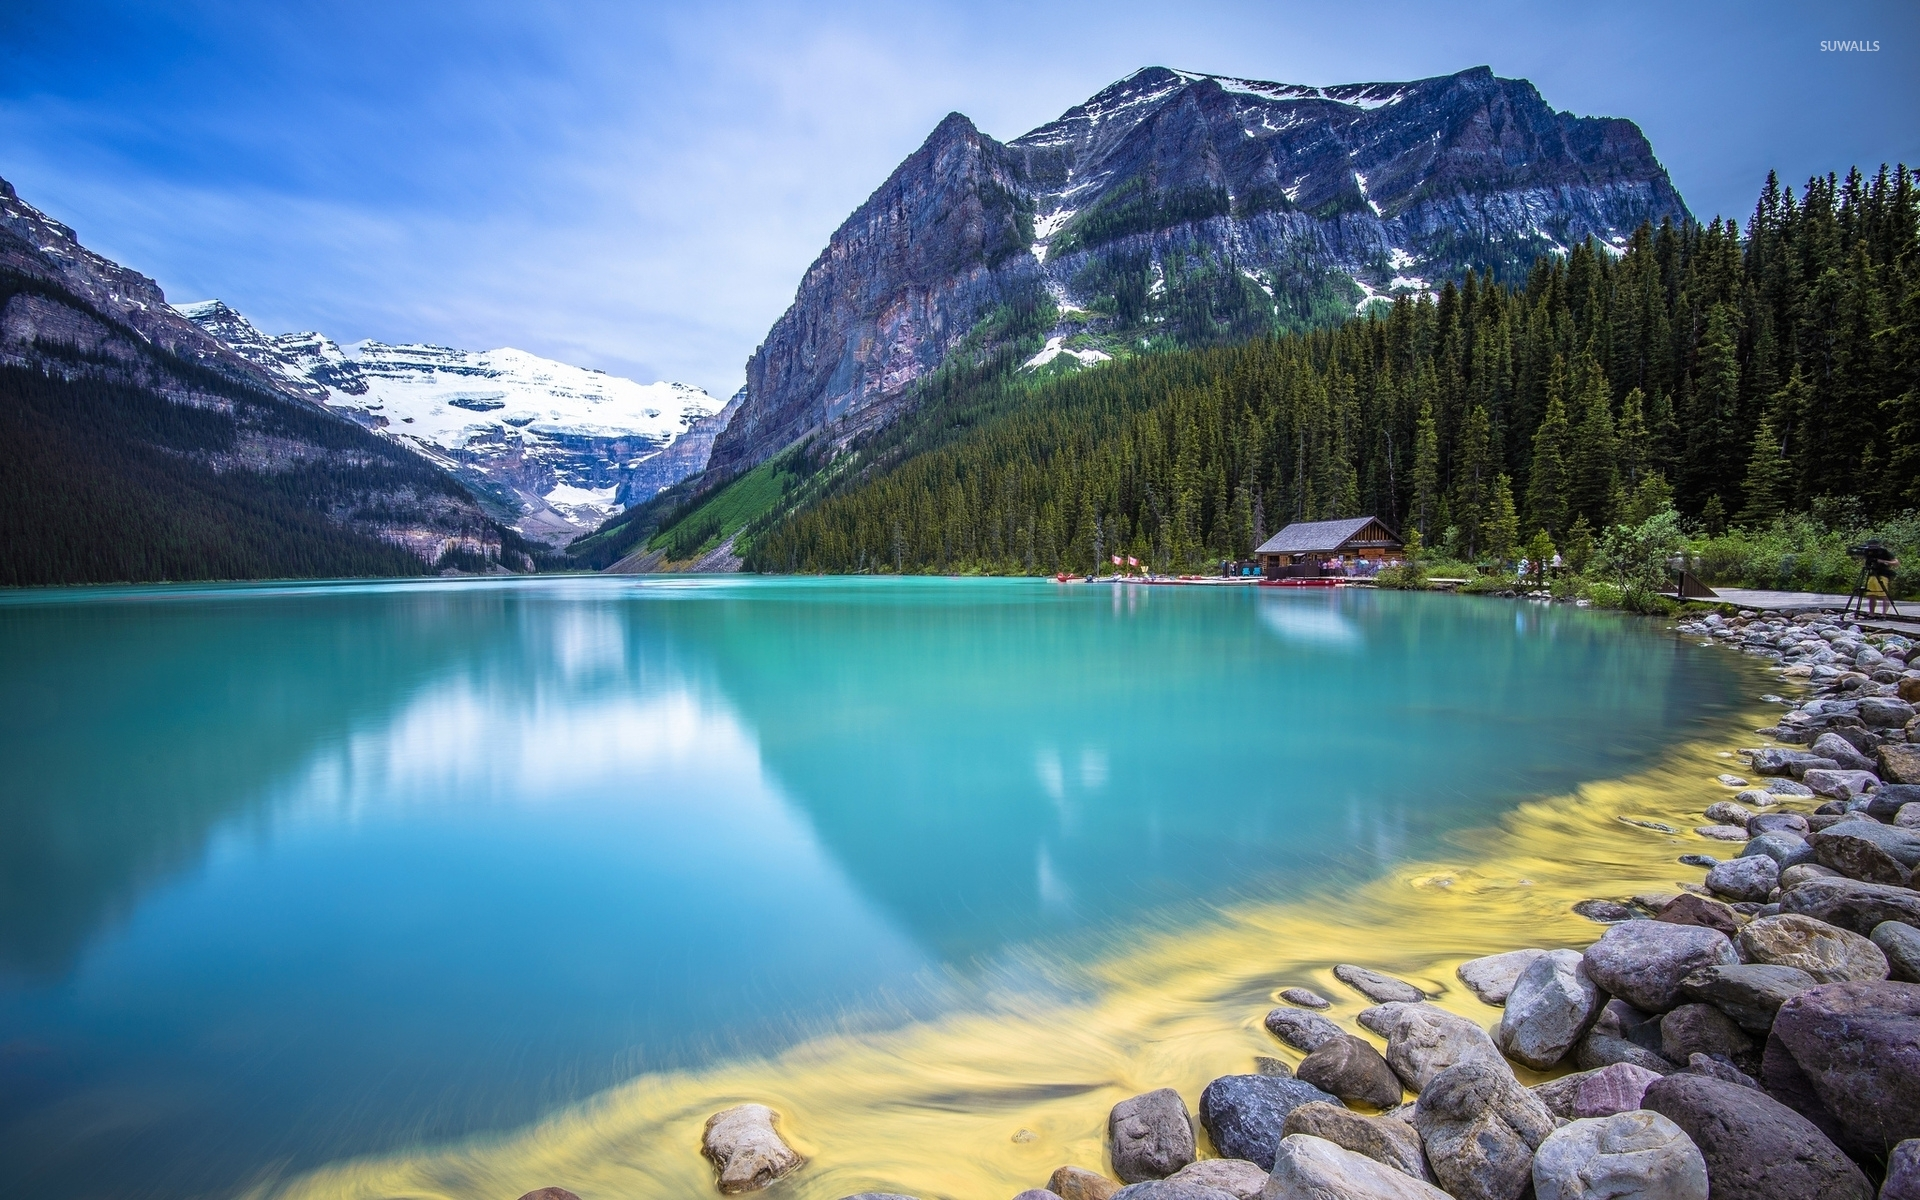 wallpaper amazing mountain lake - photo #8